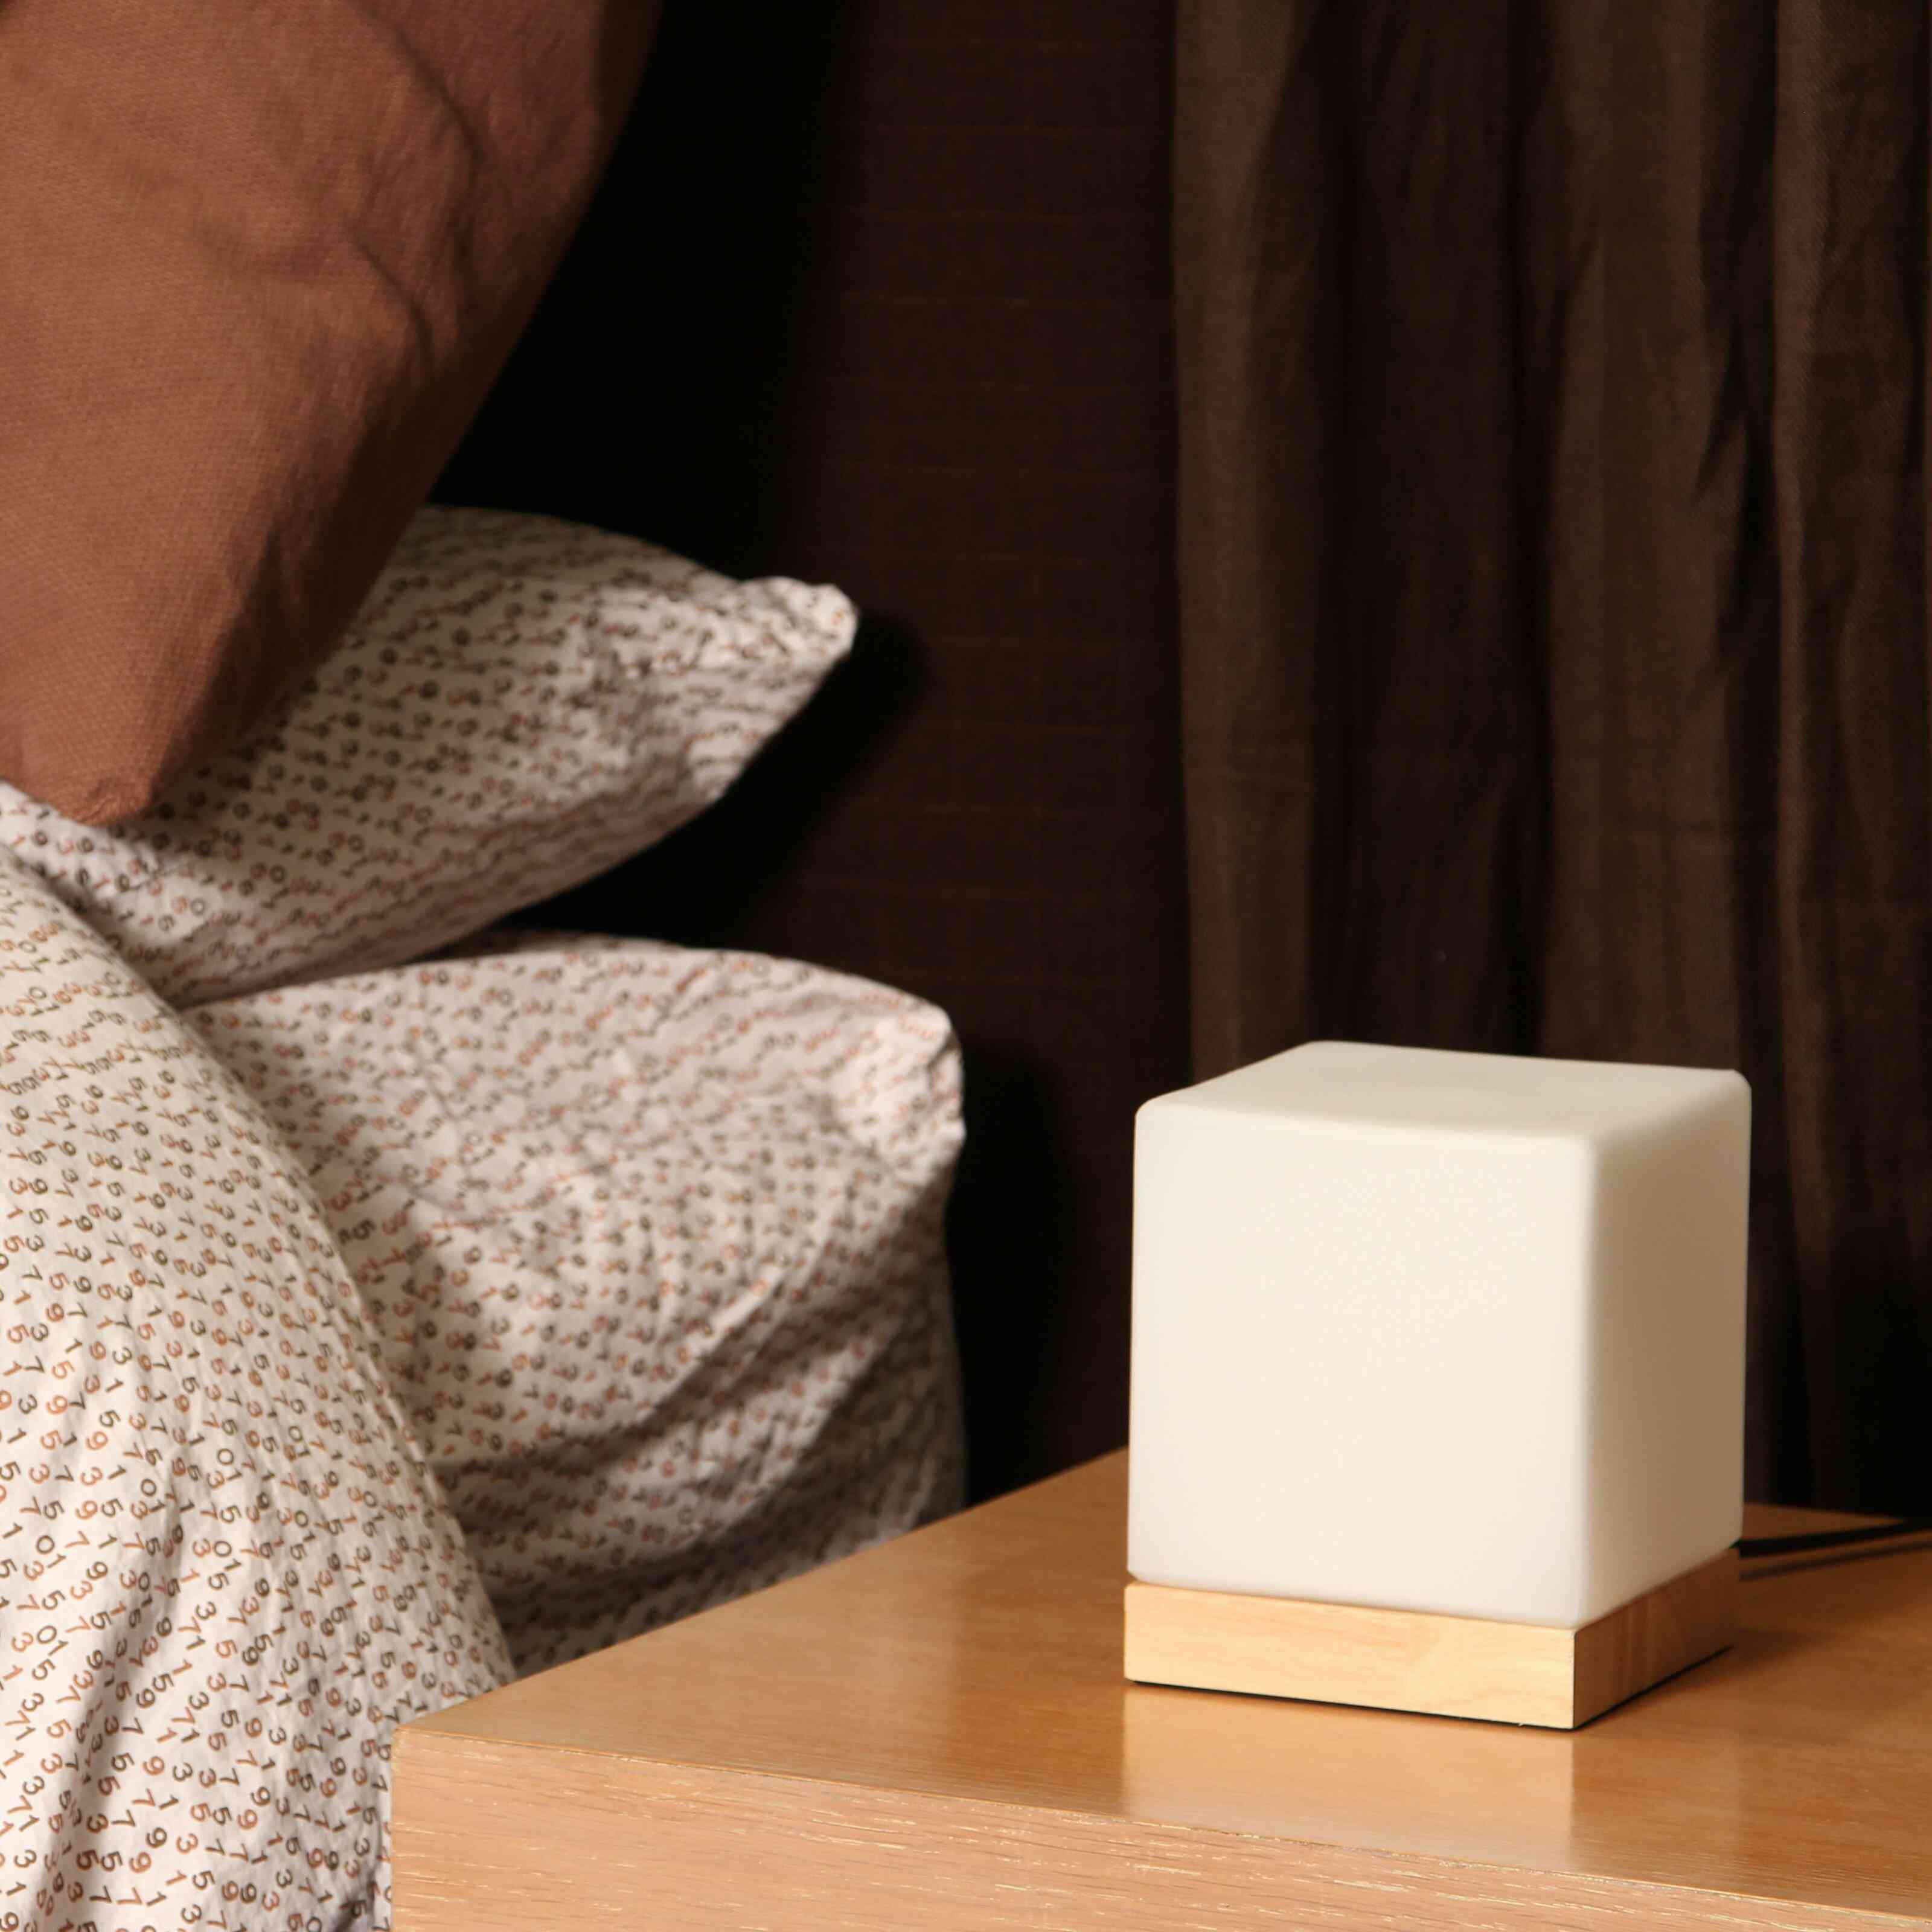 "Anwan 6.3"" Natural Wood Bedside Table Lamp"